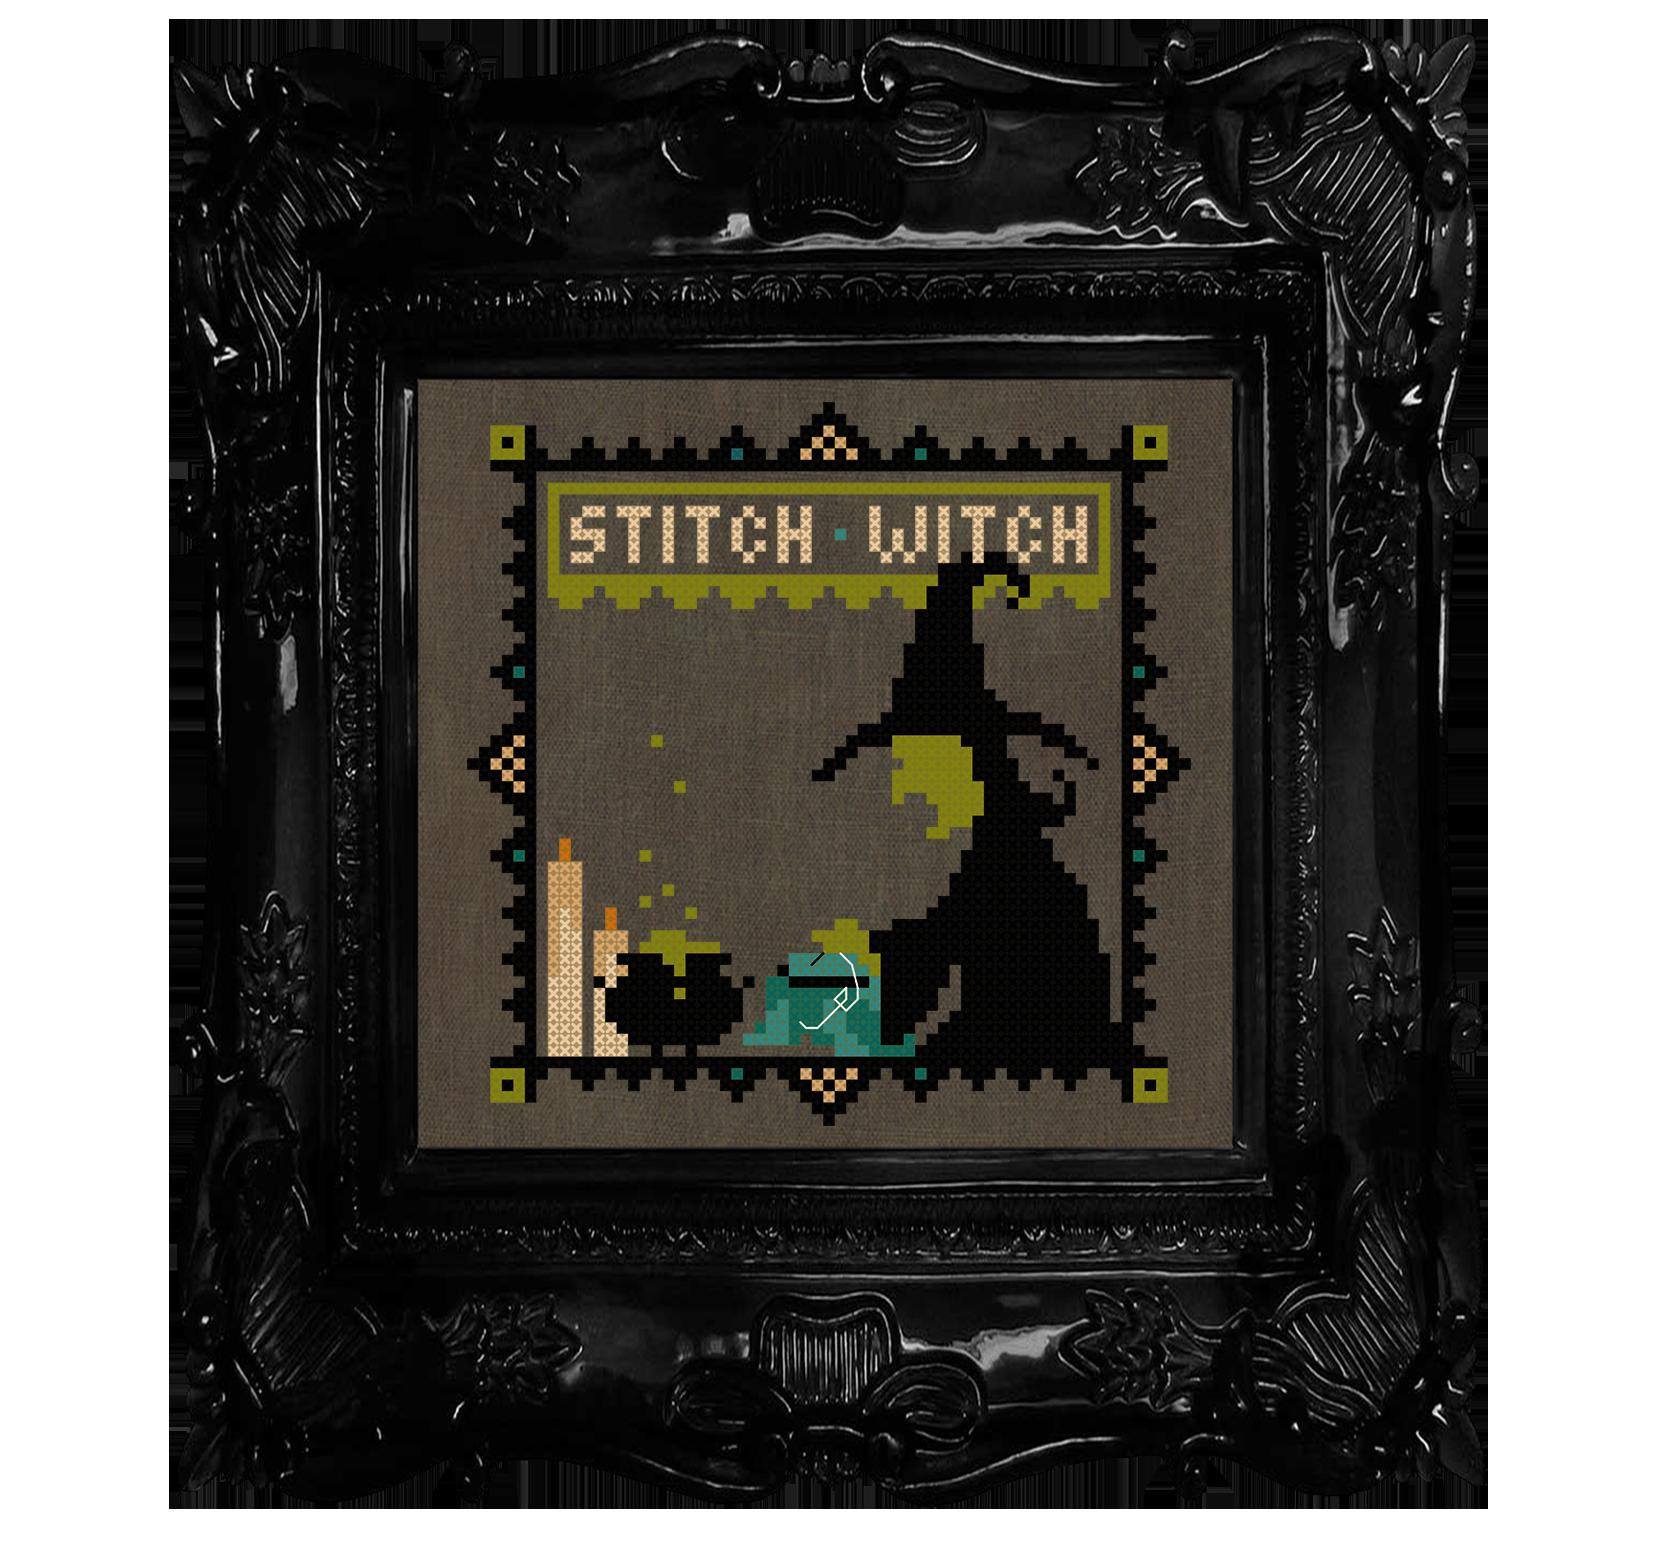 Stitch Witch Box Review